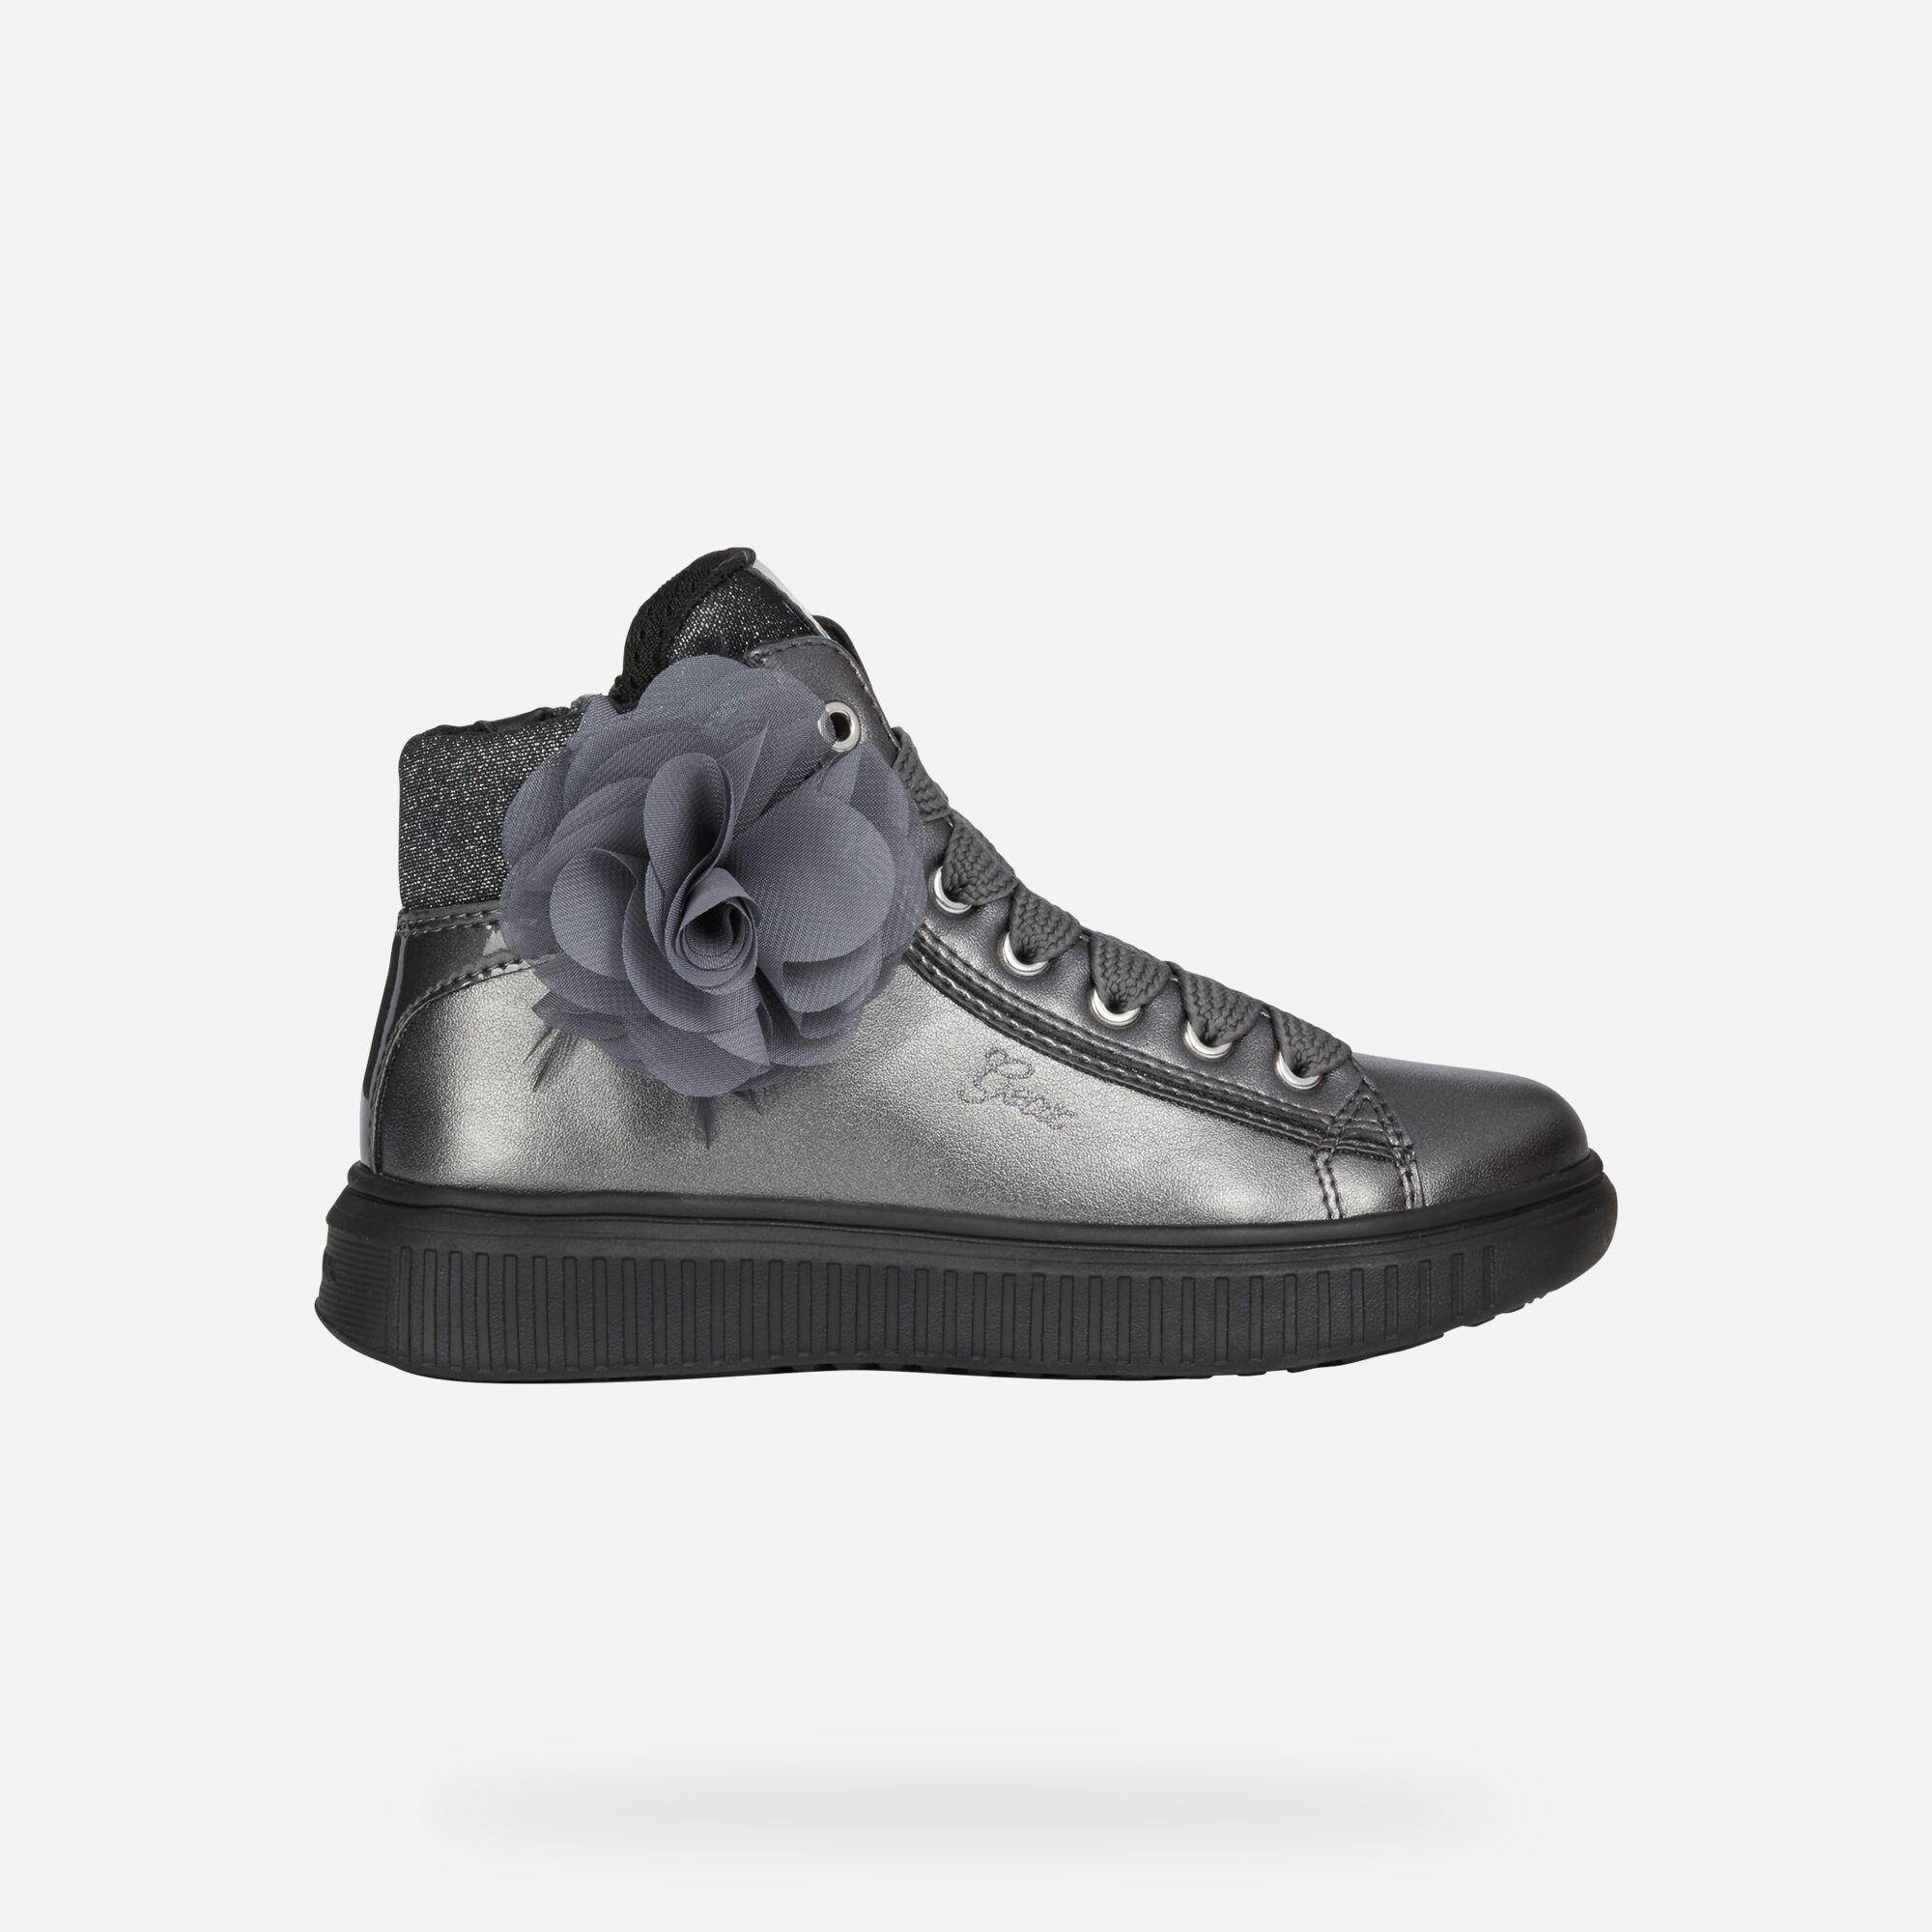 Geox DISCOMIX Mädchen: dunkelsilberne Sneakers High | Geox ®